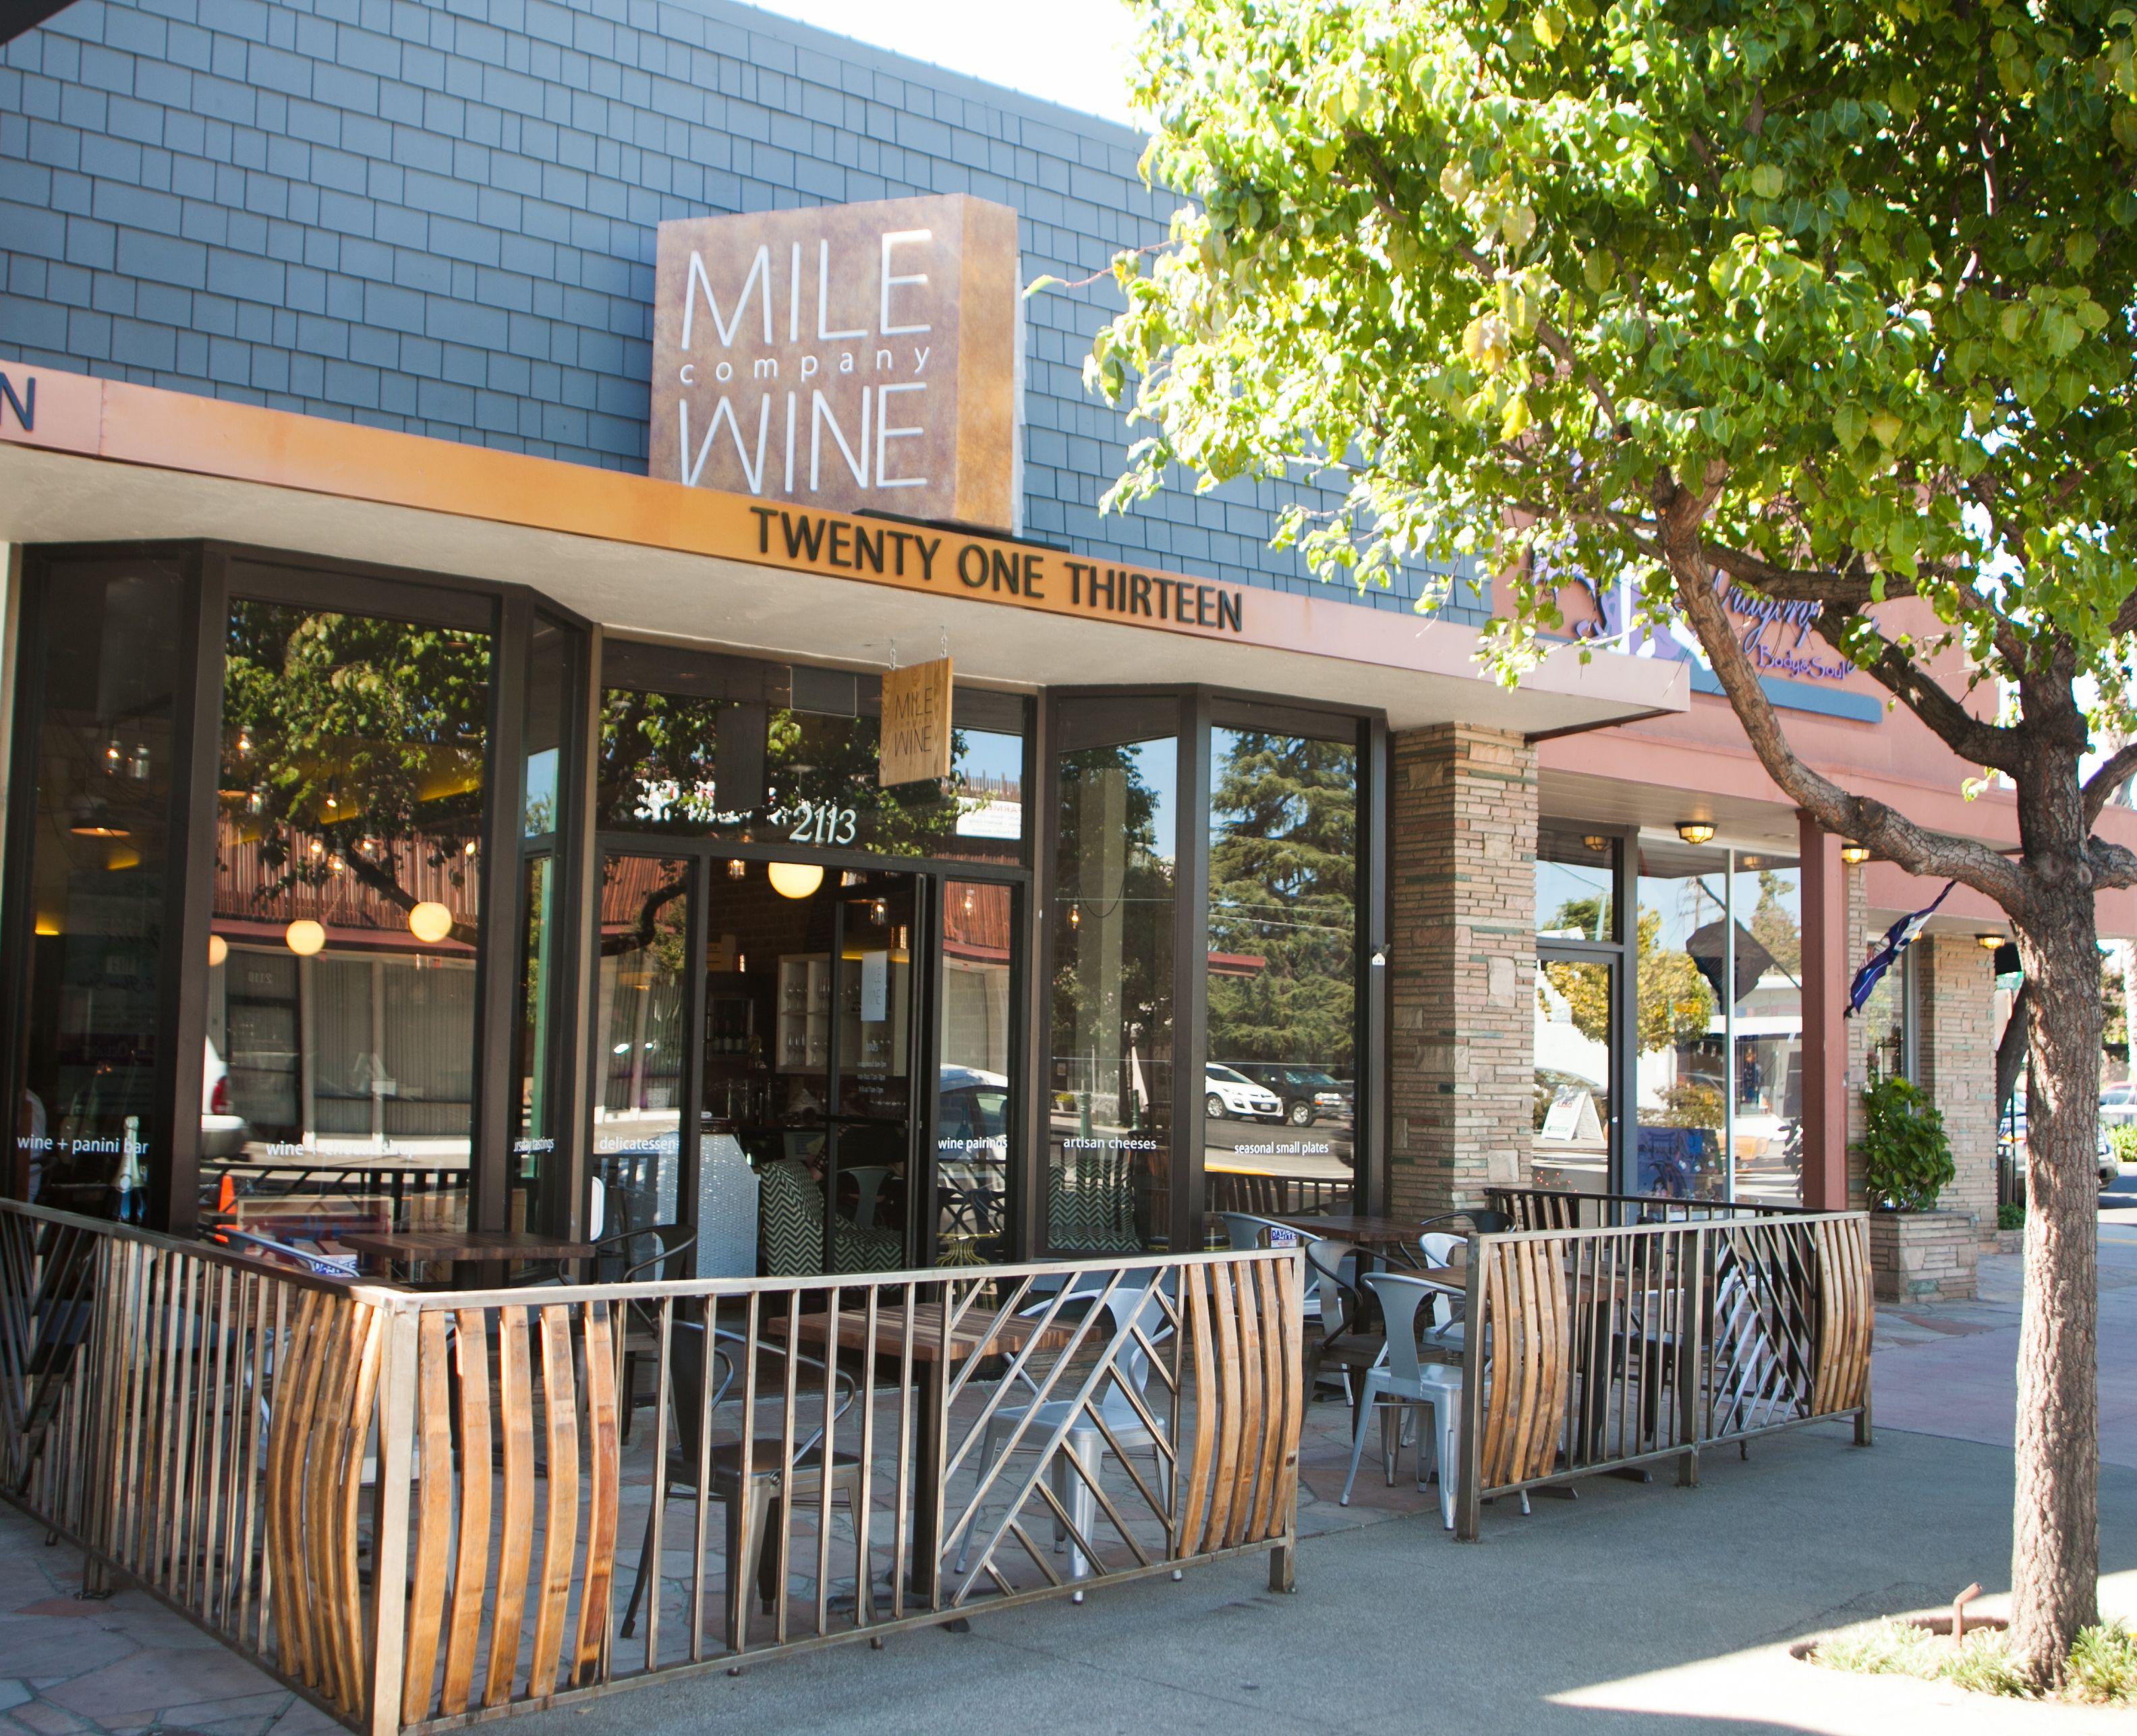 Facade, sidewalk seating, wine barrel stave fence, signage